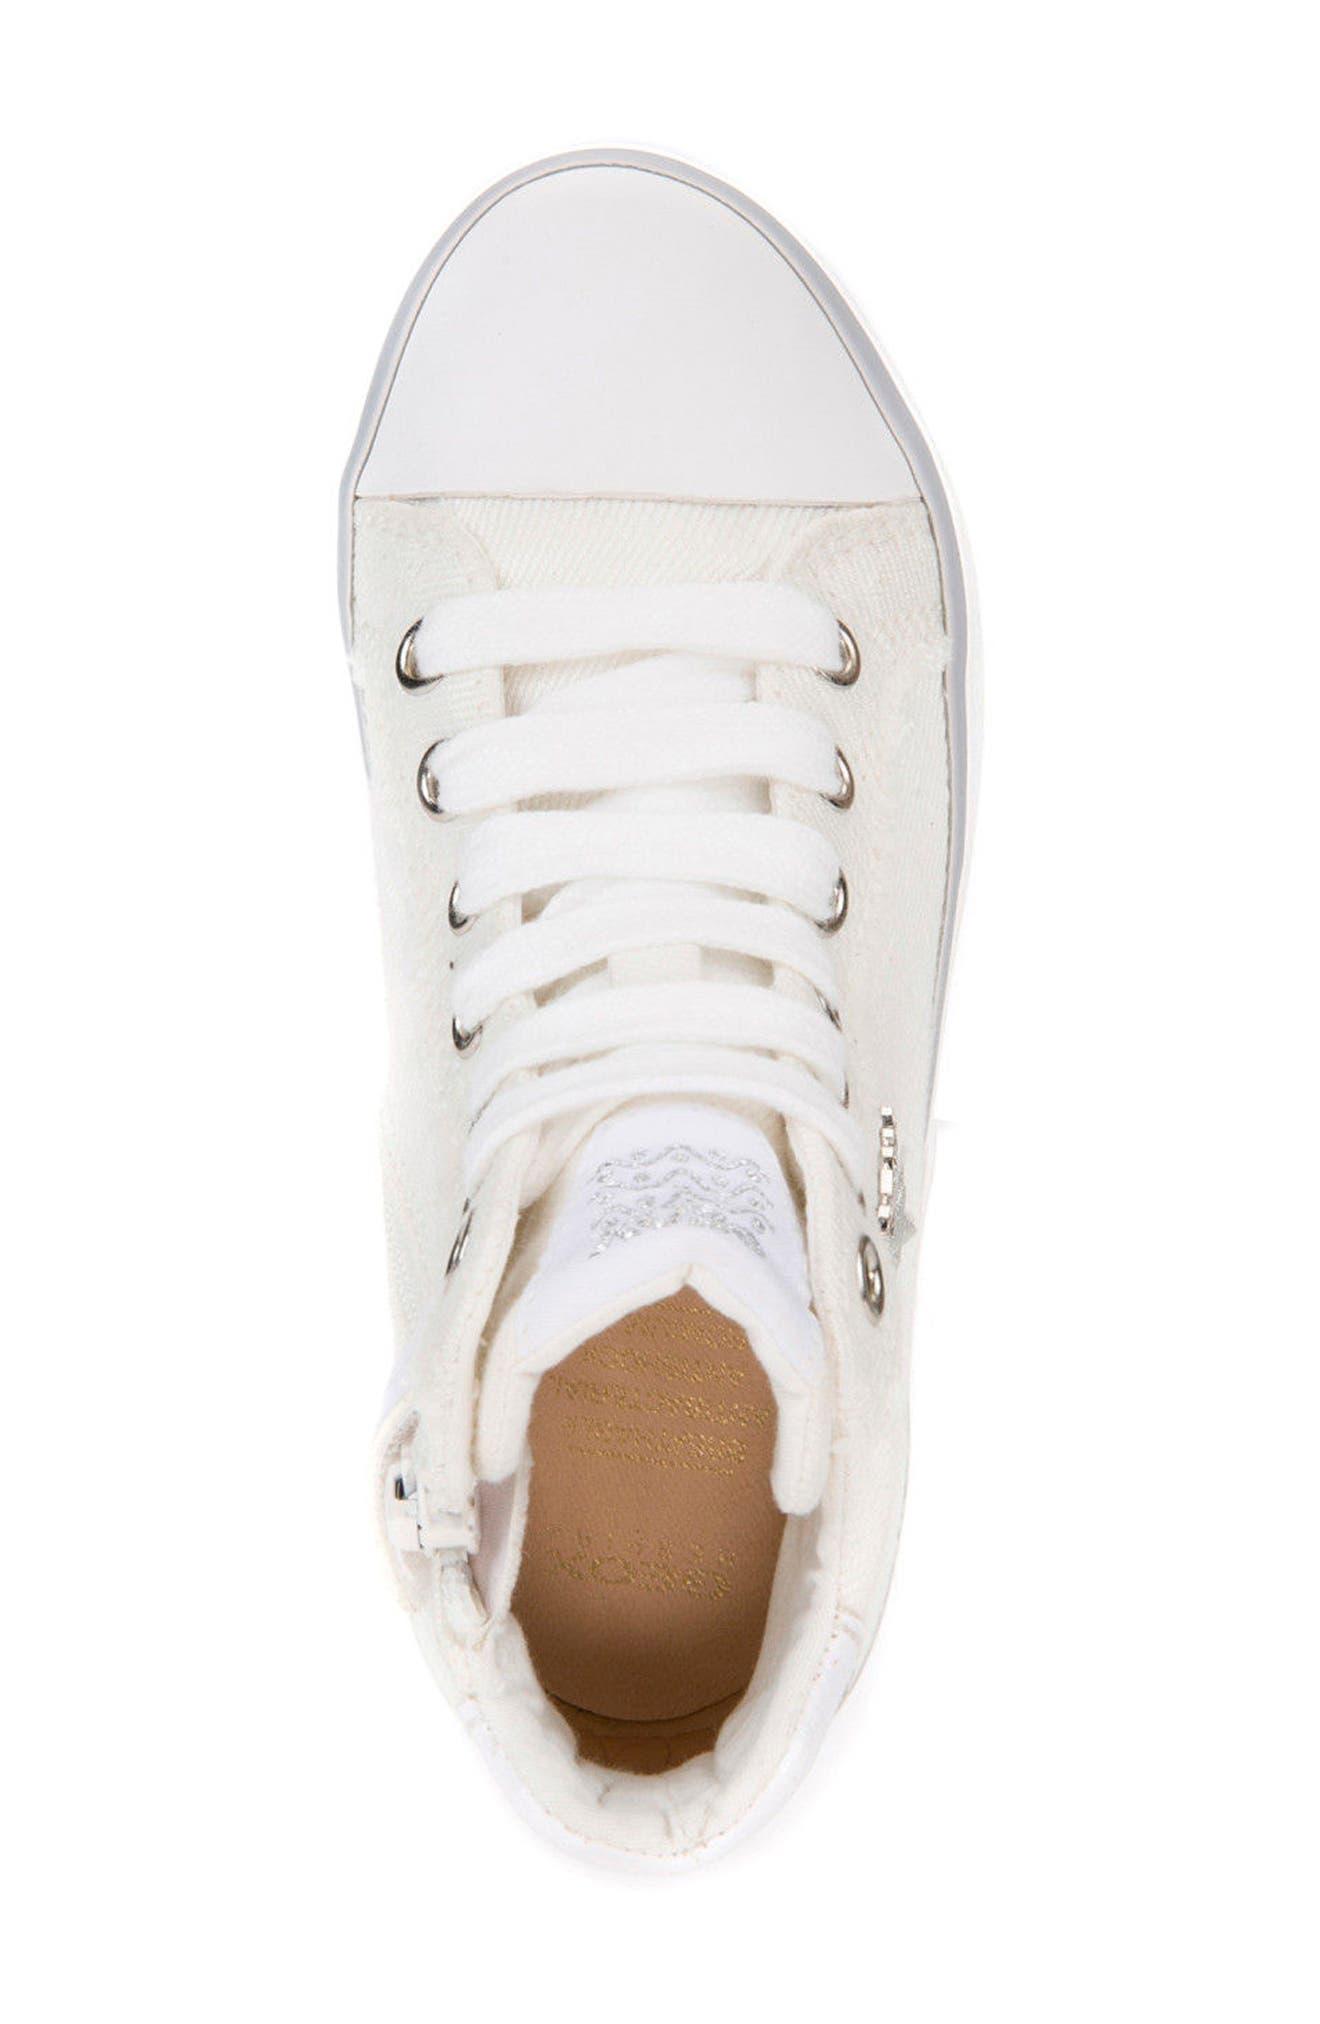 Kilwi High Top Zip Sneaker,                             Alternate thumbnail 5, color,                             WHITE